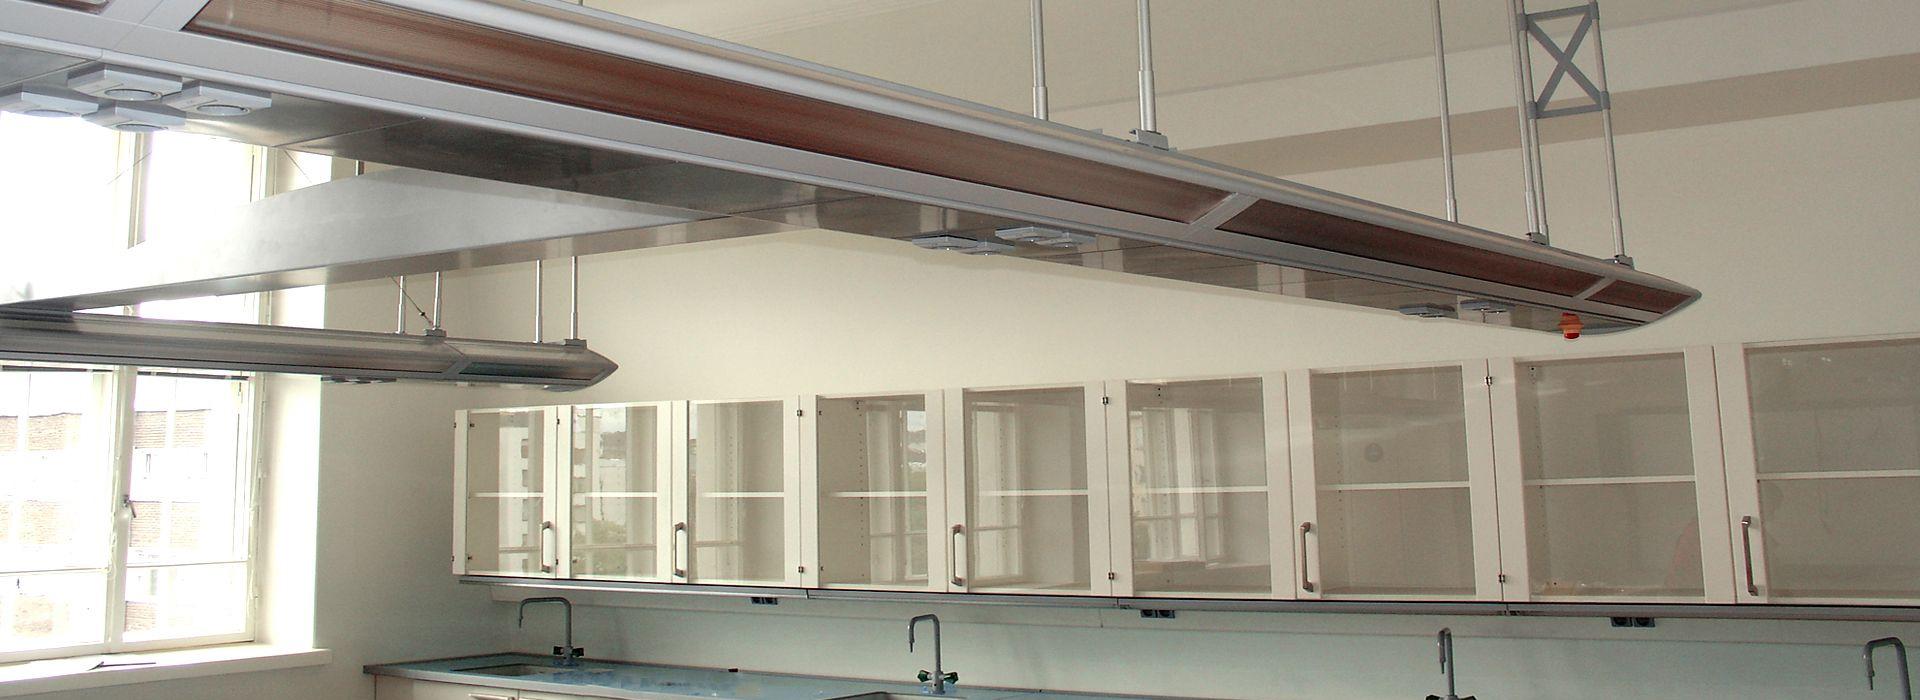 Science lab with ceiling supply, KERTTULIN LUKIO, TURKU